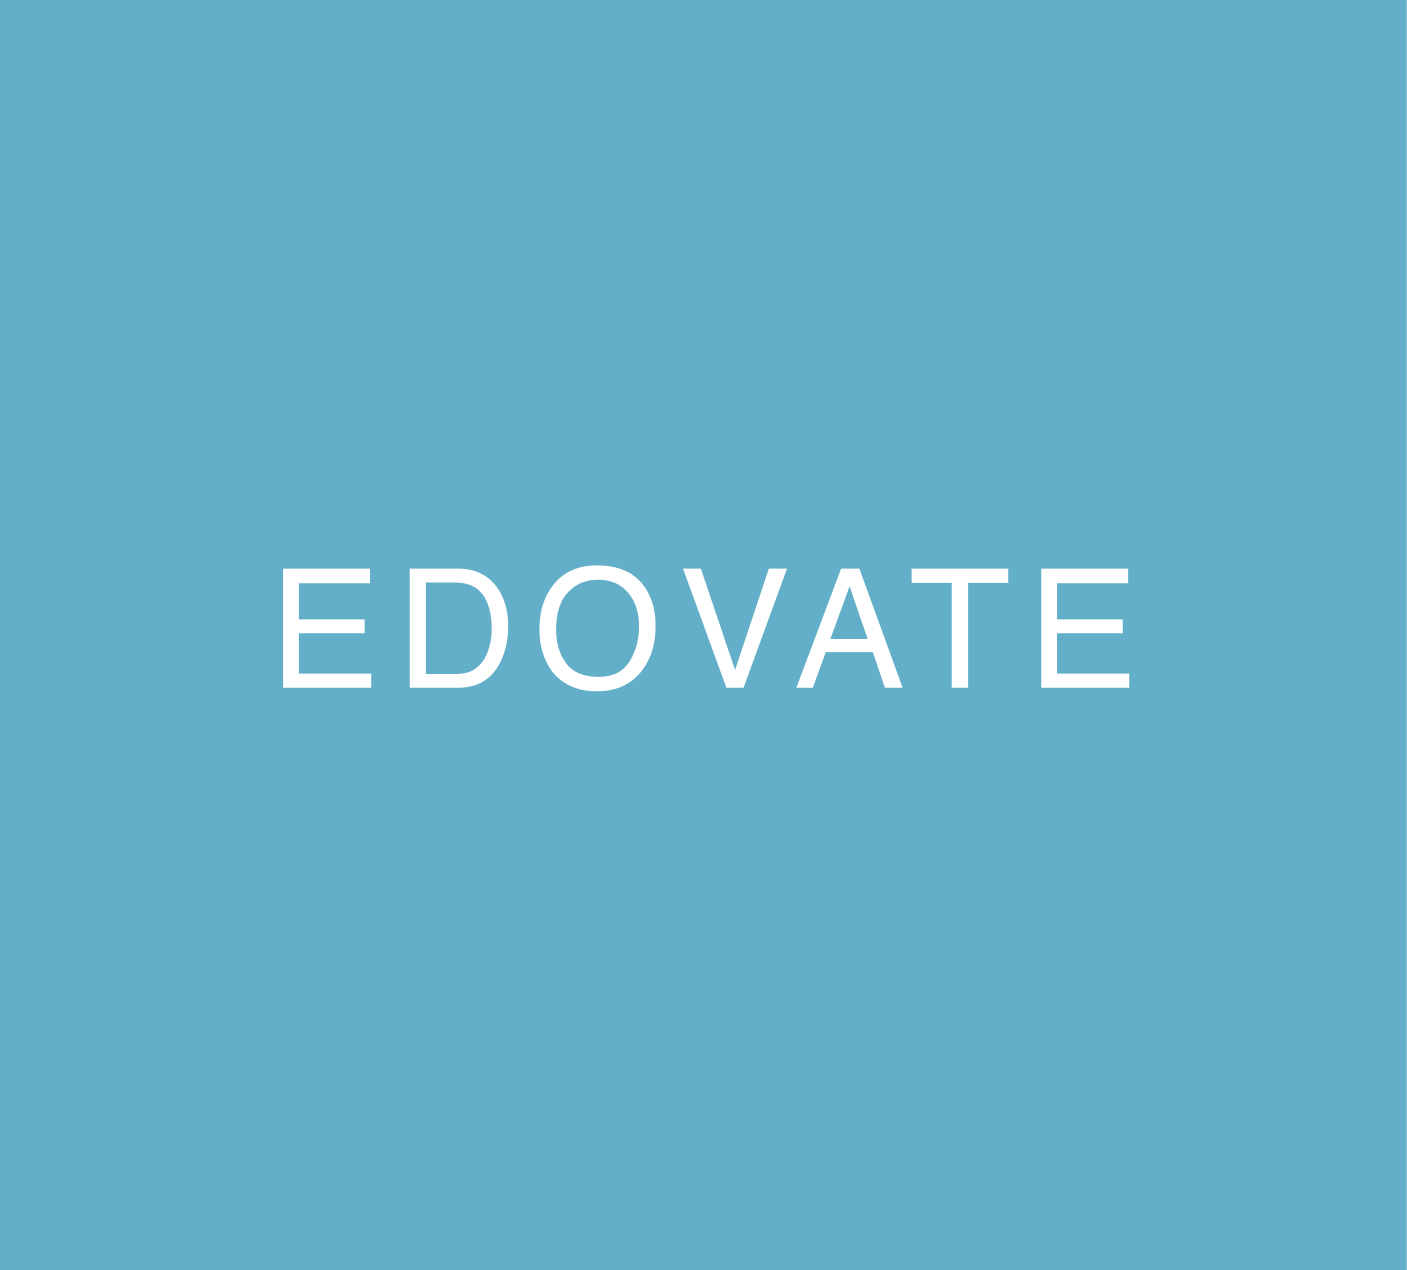 EdTech VC Firm Edovate